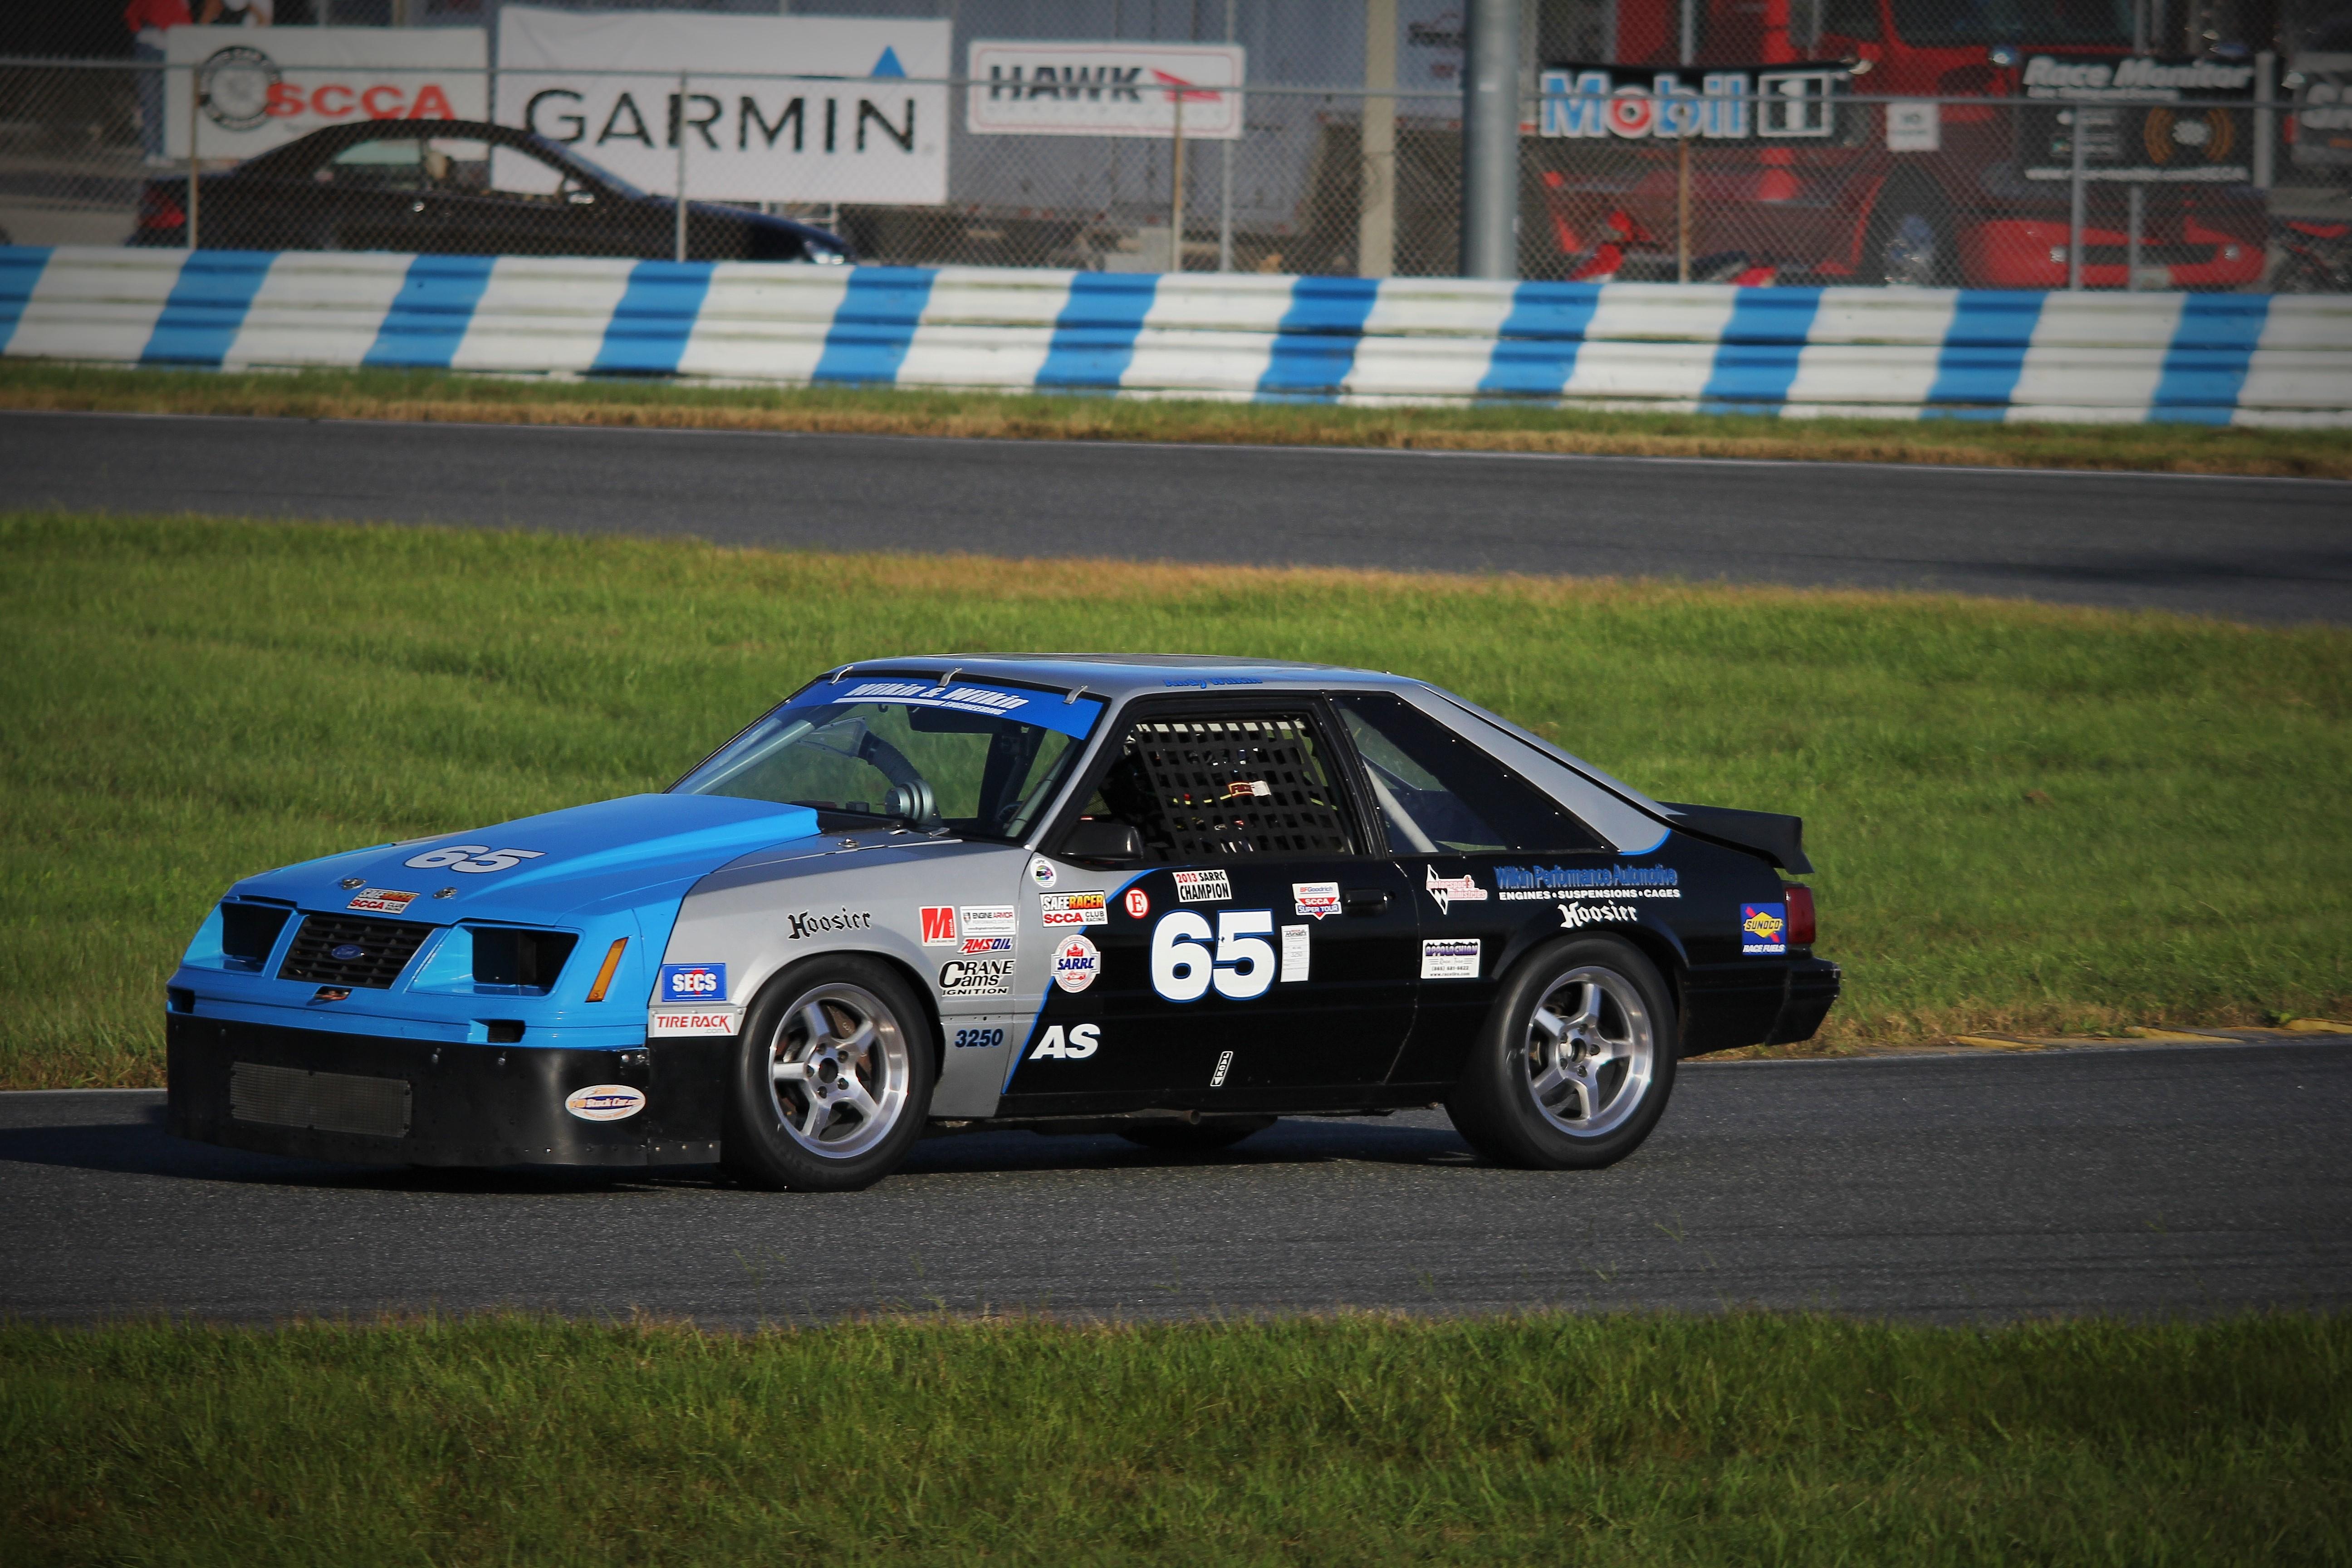 SCCA Roundup Gallery from Daytona International Speedway ...